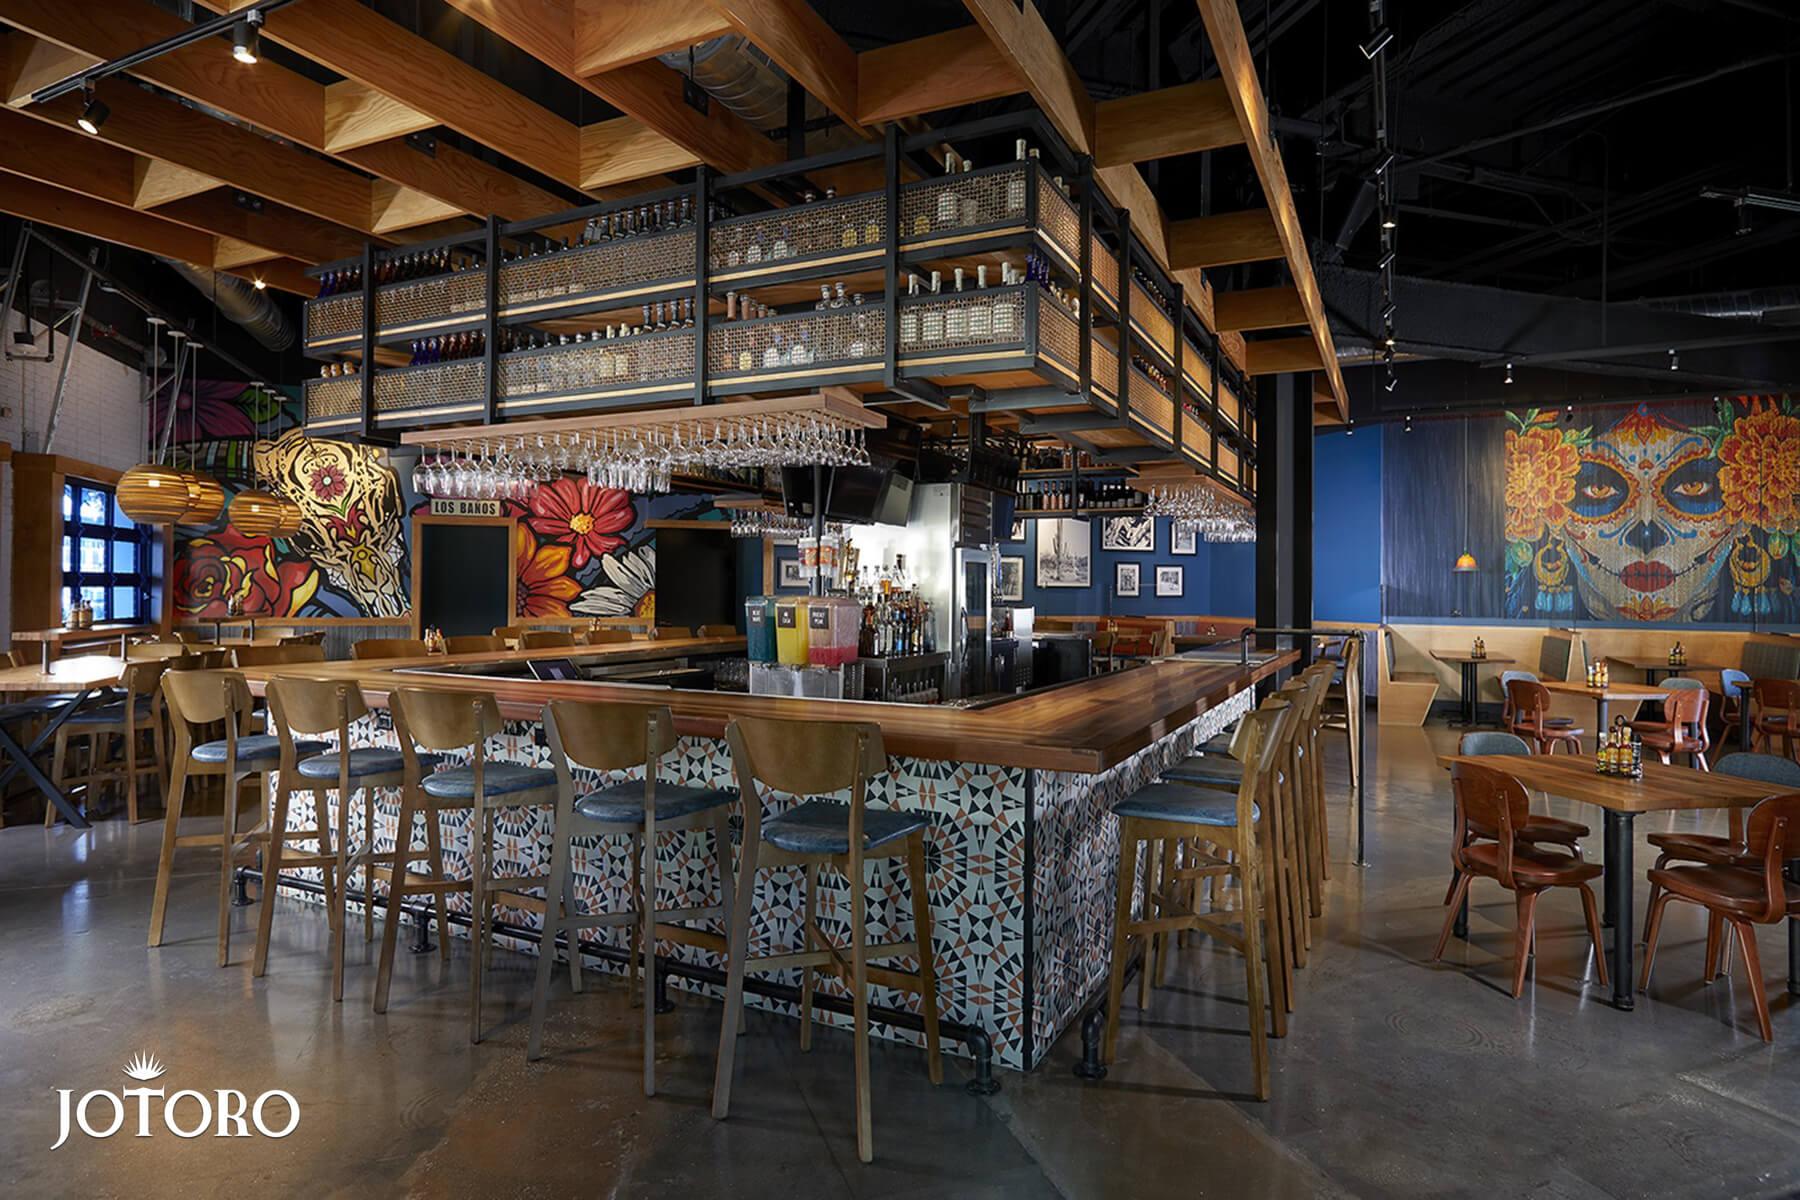 Jotoro Kitchen & Tequila Bar - Tampa, FL